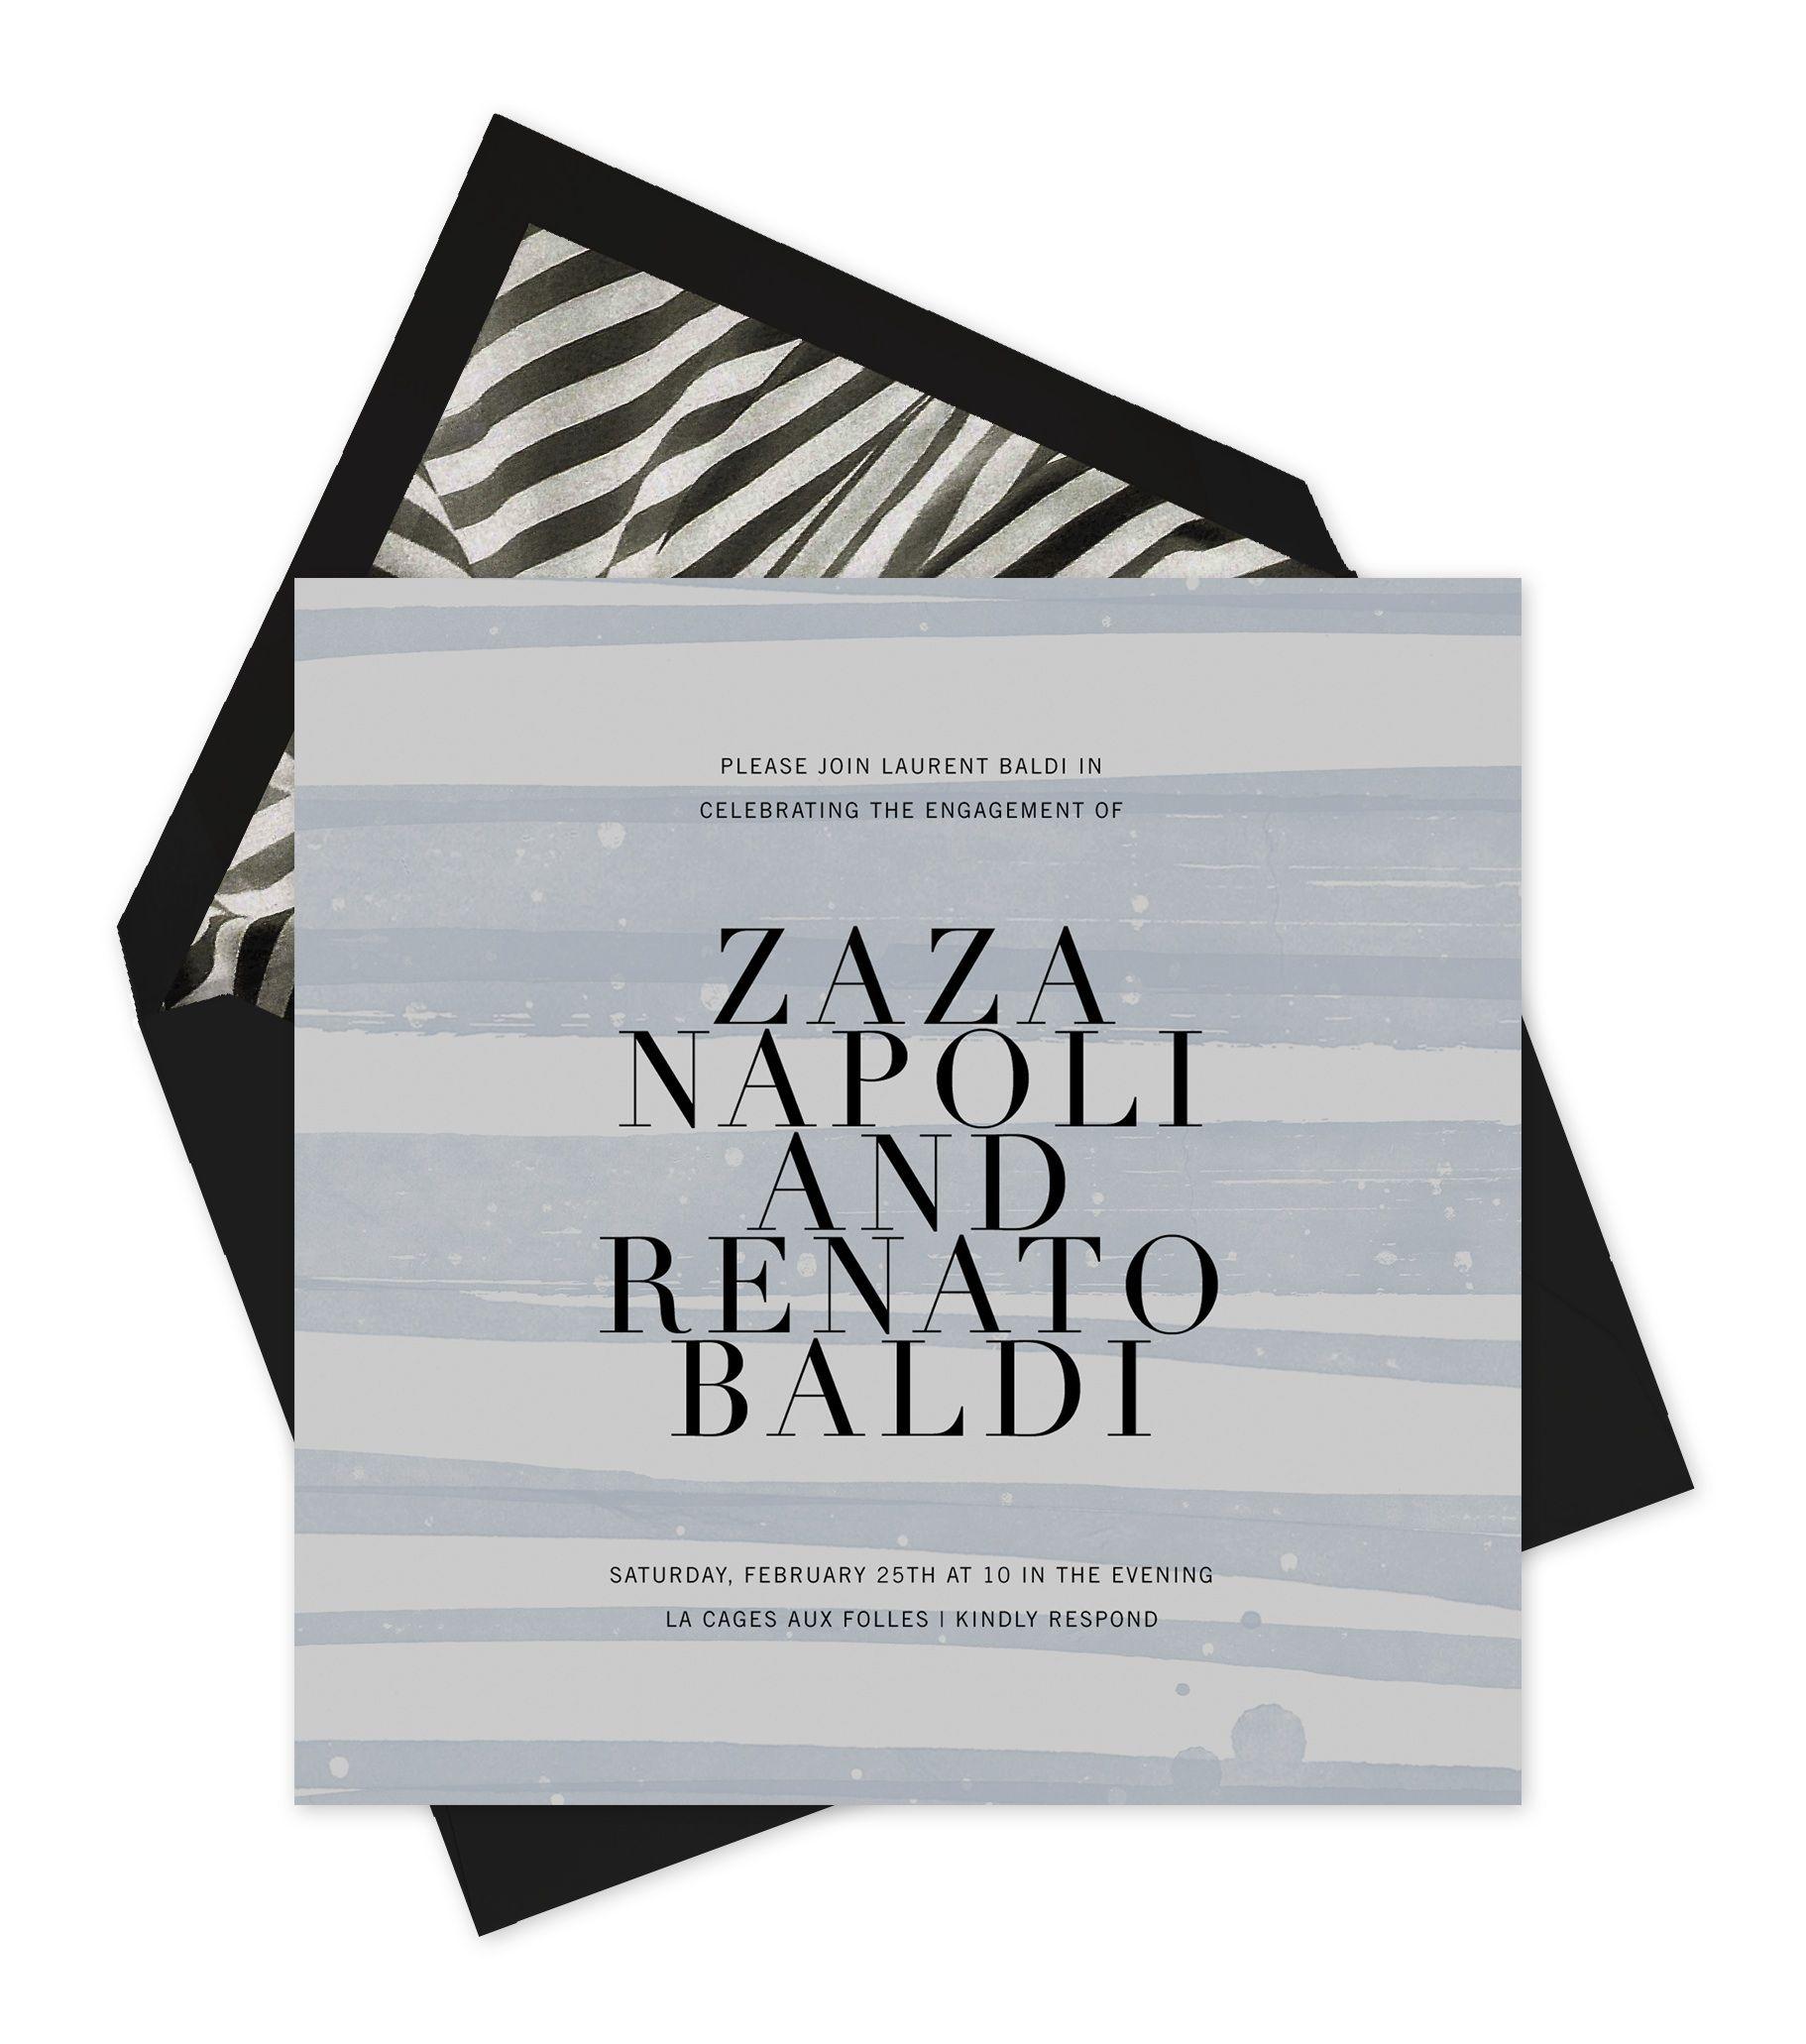 Elegant font, laser-printed on plain paper, individually streaked ...